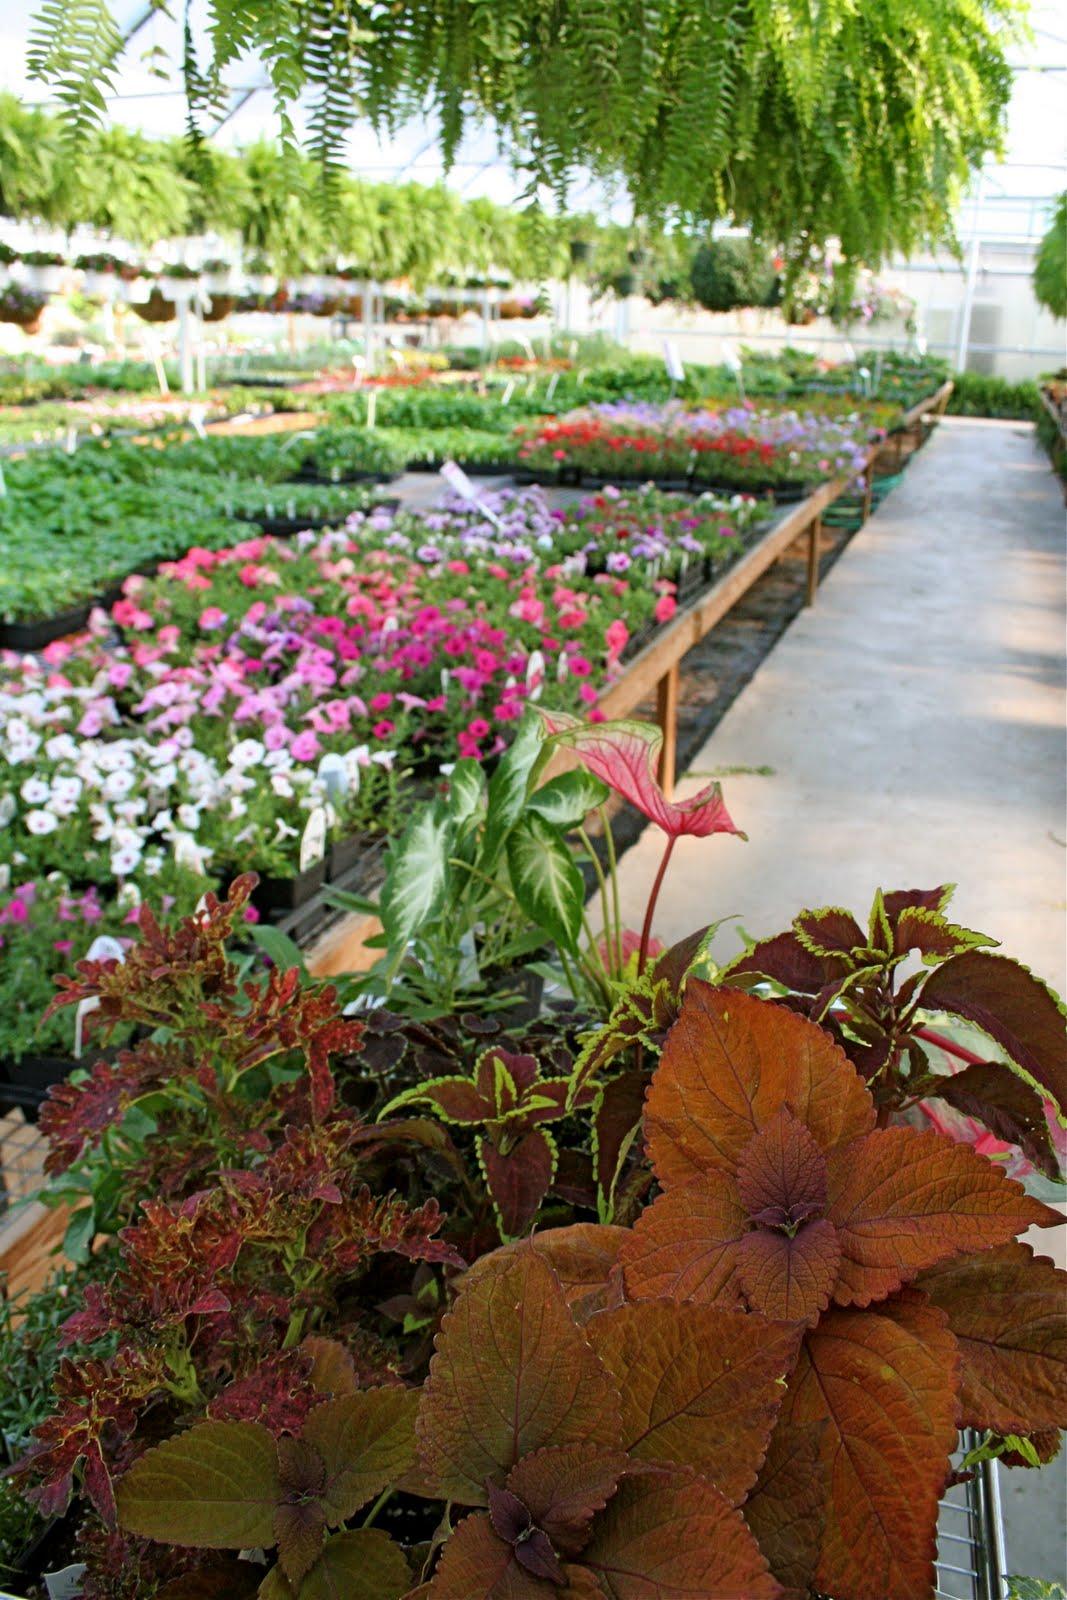 Homestead Is A Large Garden Center That Carries Garden Tools, Sprays,  Fertilizers, Pots, Birdhouses, Feeders, Wind Chimes, Soils, ...